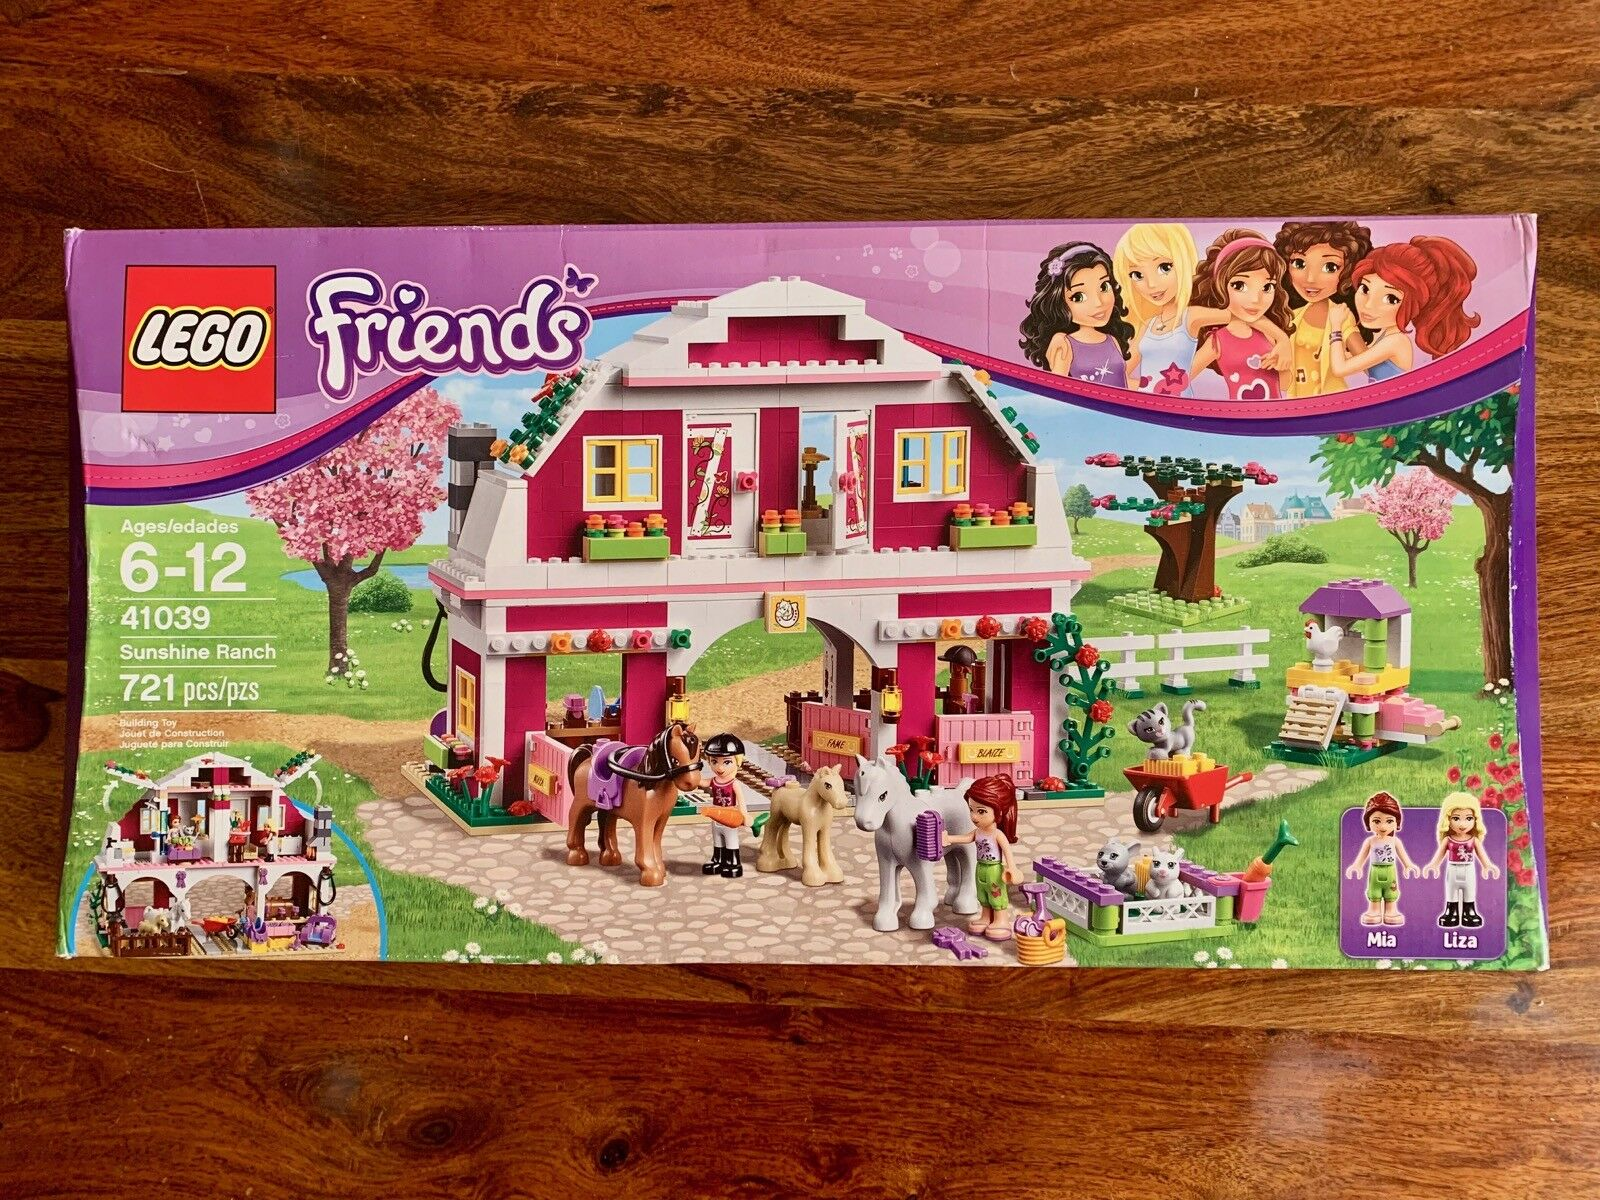 NEUF Lego Friends 41039 Sunshine Ranch